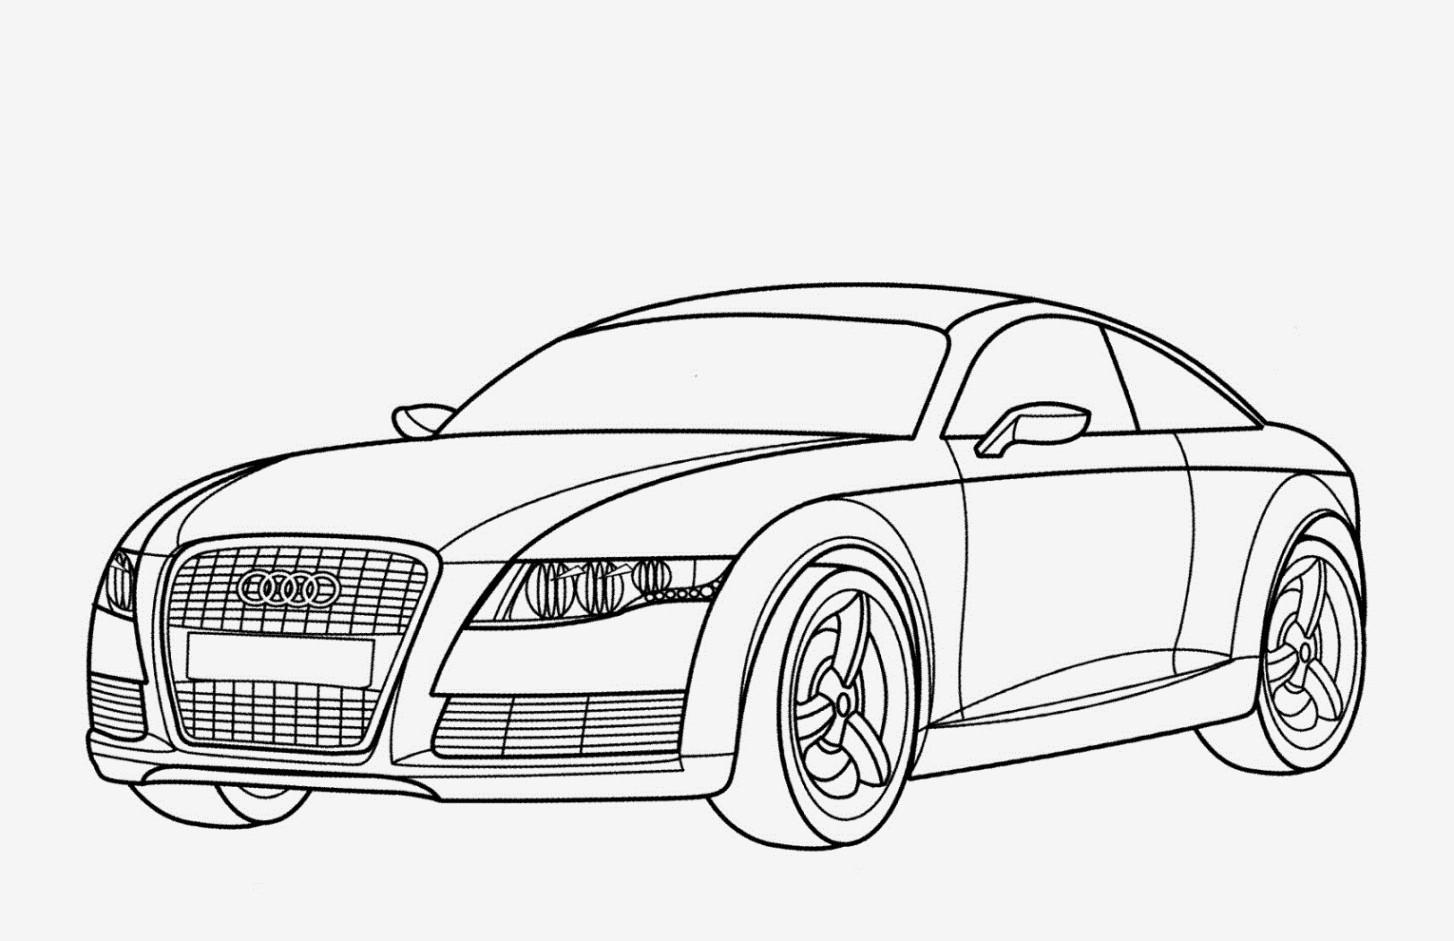 Kleurplaat Audi Q8 • Kidkleurplaat.nl